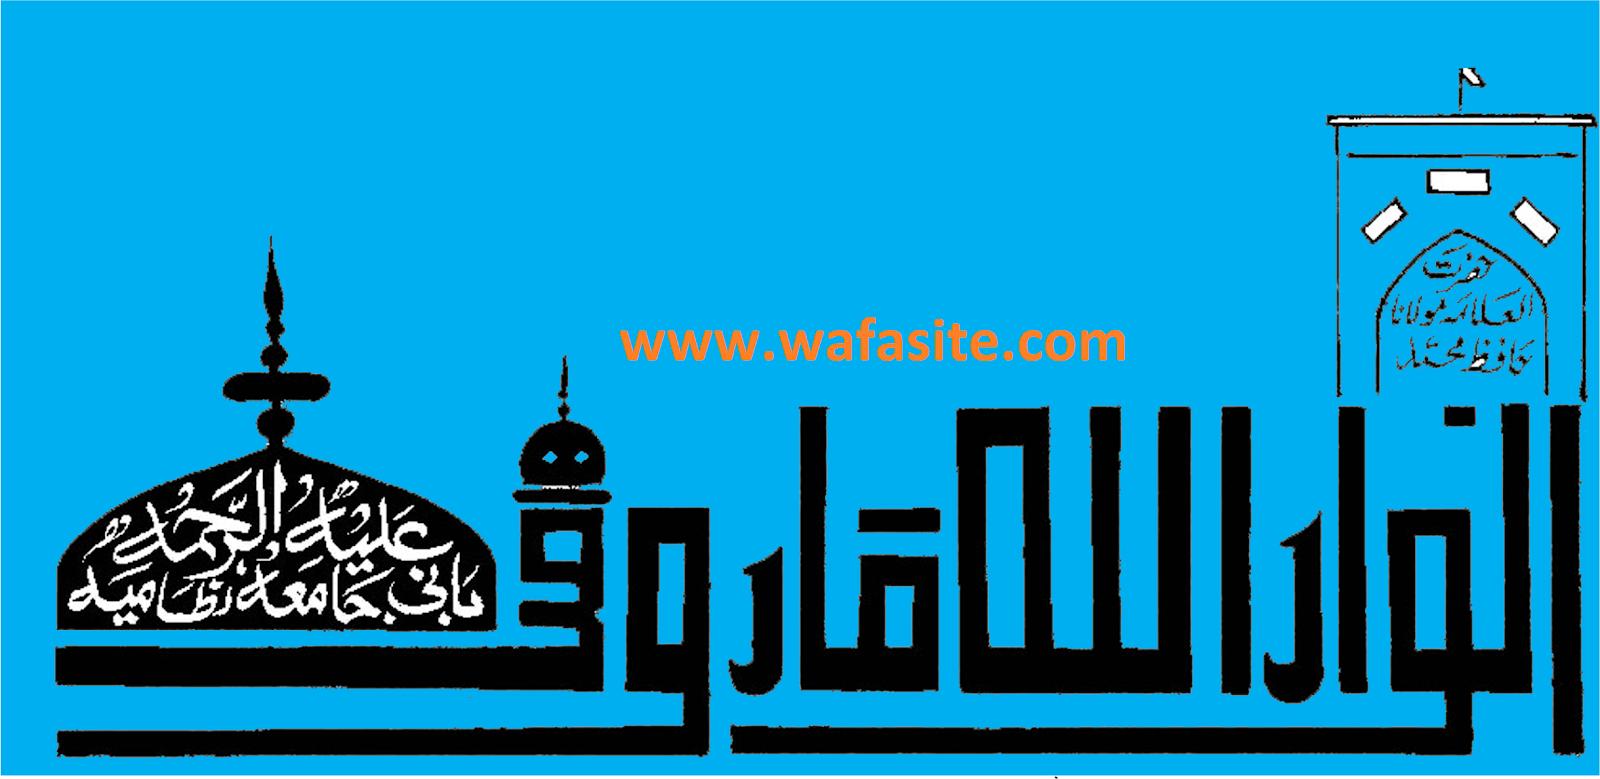 https://play.google.com/store/apps/details?id=com.wafasoft.shaikhul_islam.Sayed_Mohammed_Madni_miyan.ashrafi_aljilani